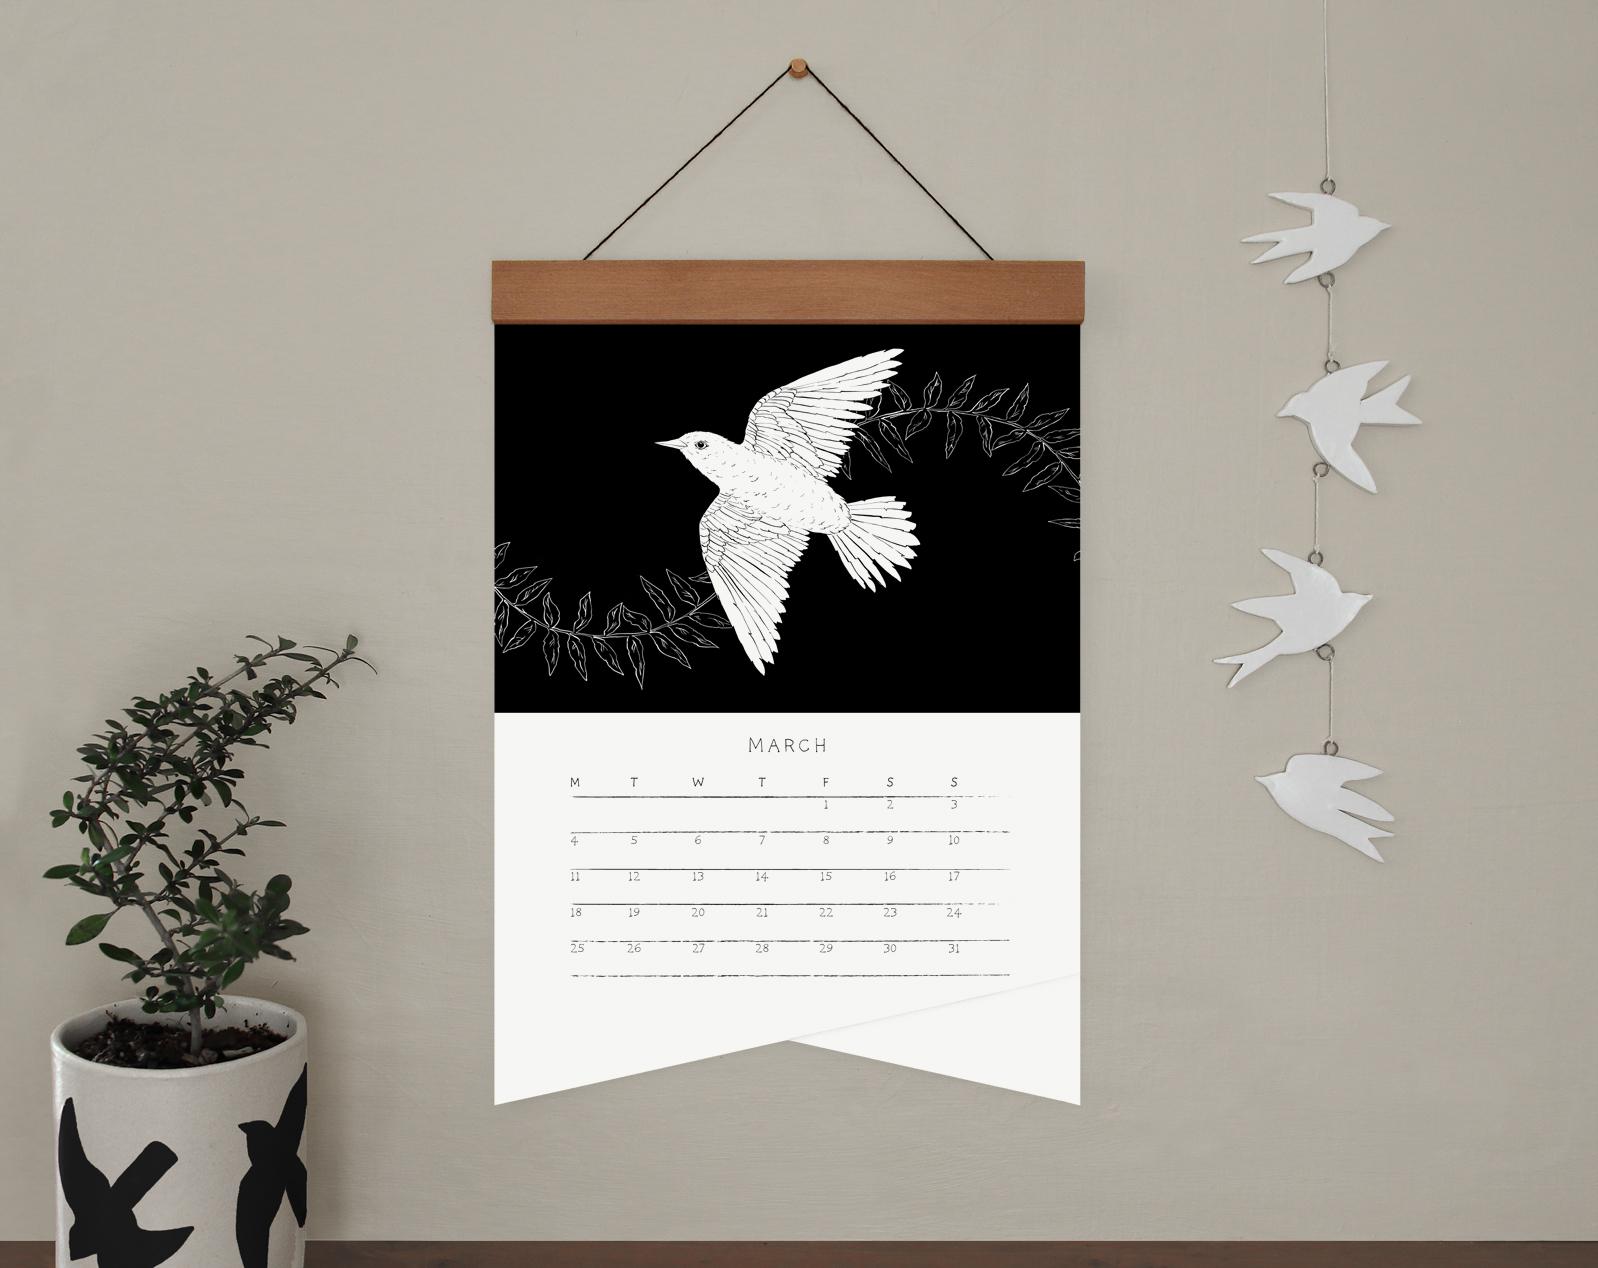 melissa boardman A3 bw calendar wood hanger 04.jpg